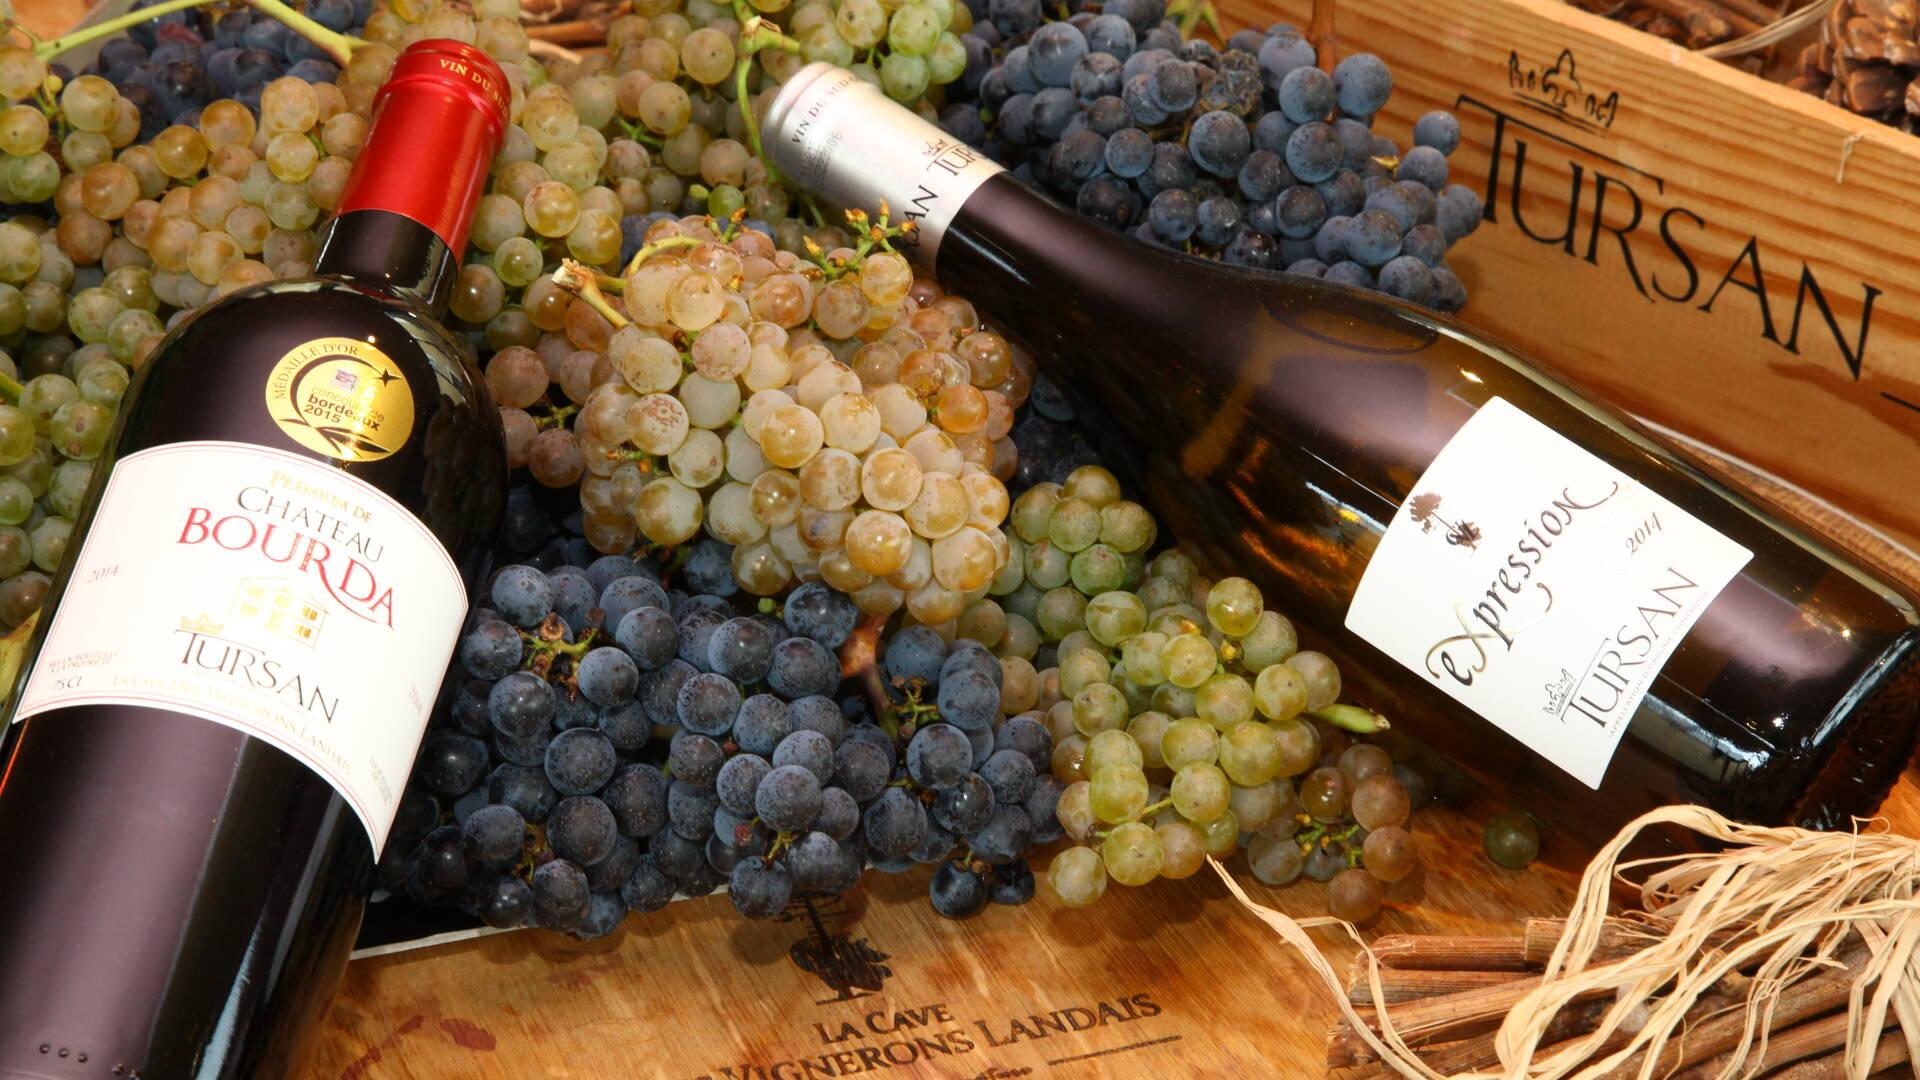 Les vins du Tursan